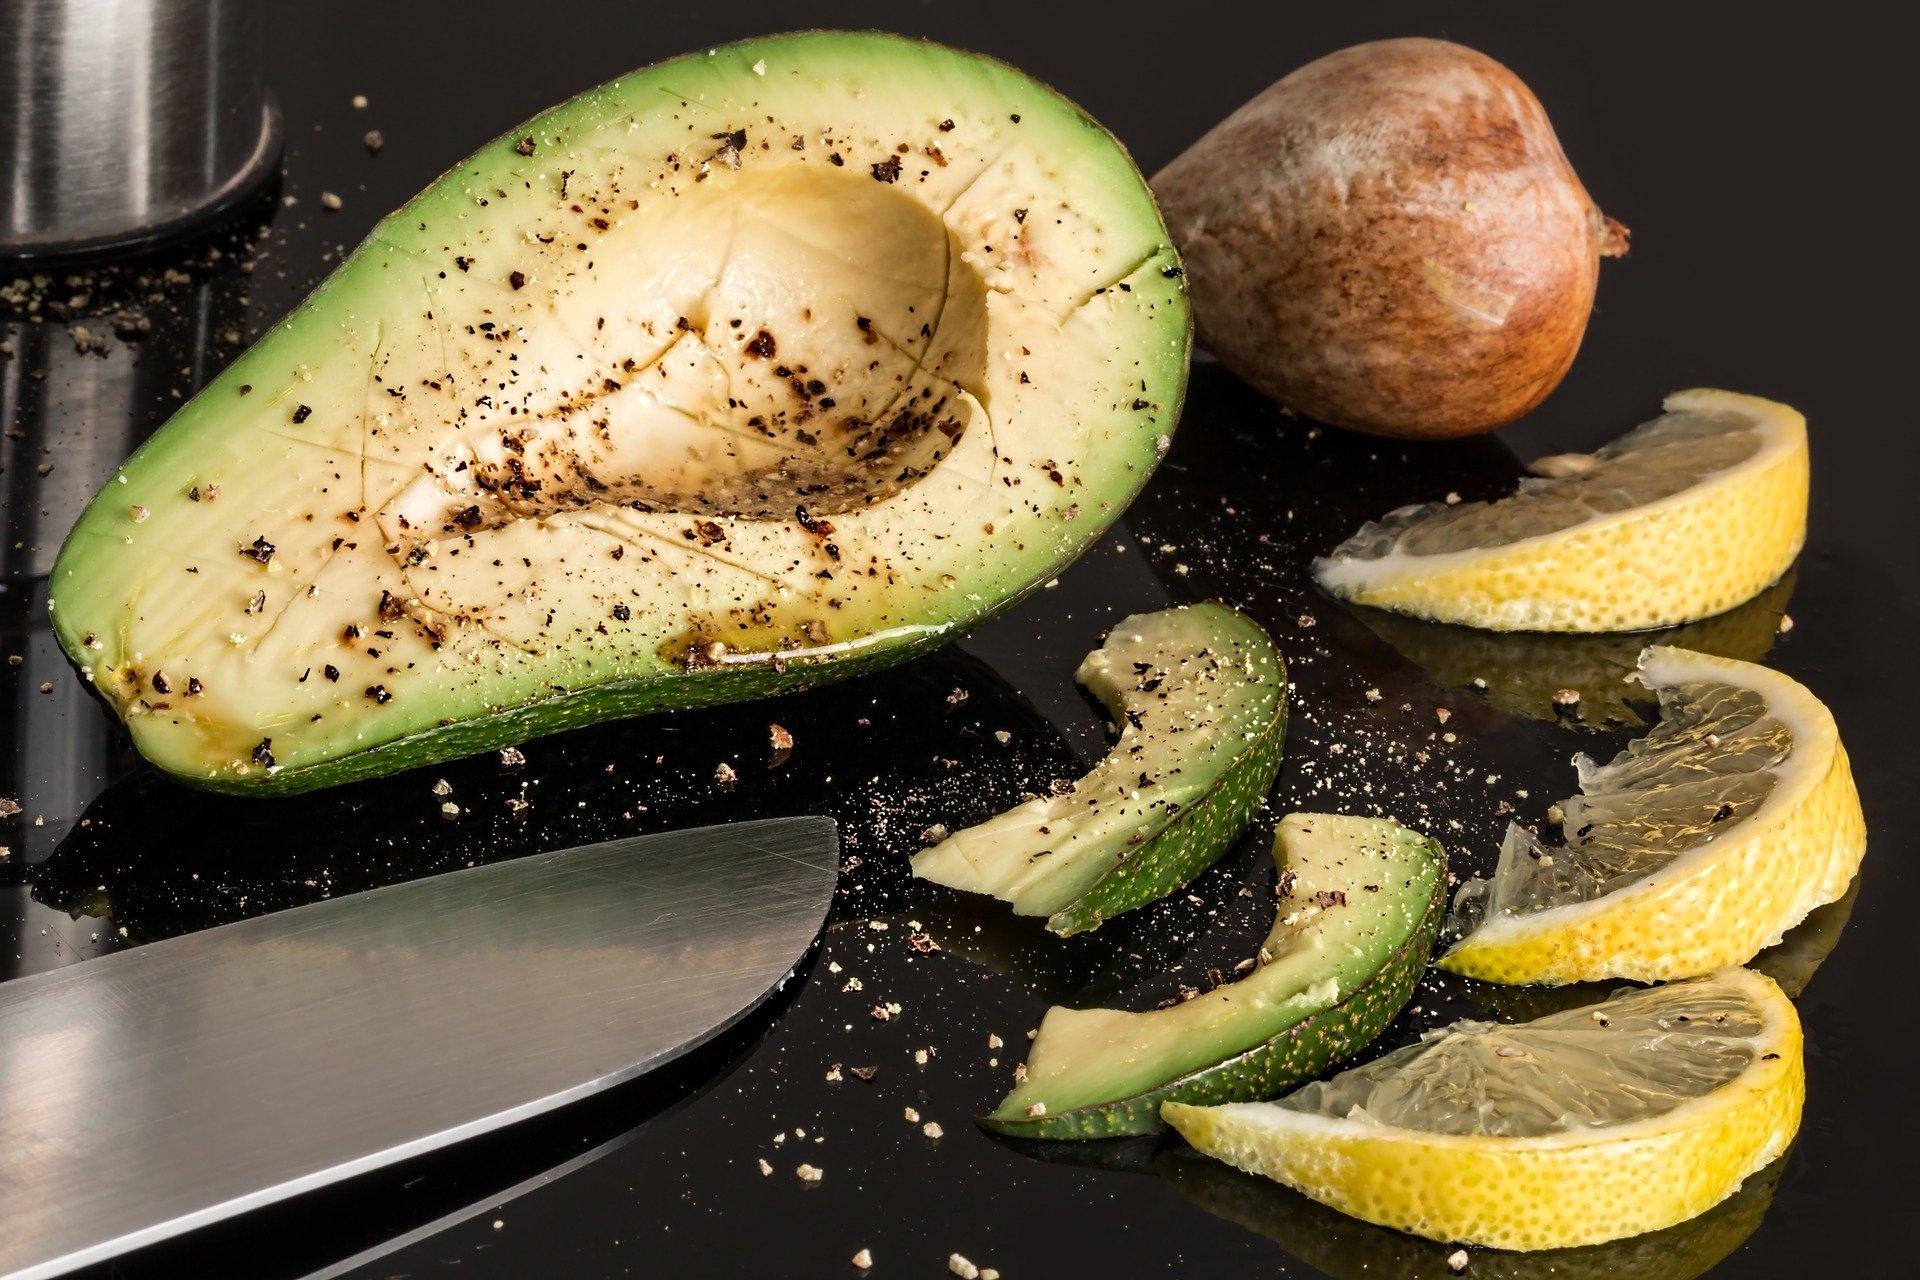 Das Fett einer Avocado kann Insulinresistenz rückgängig machen